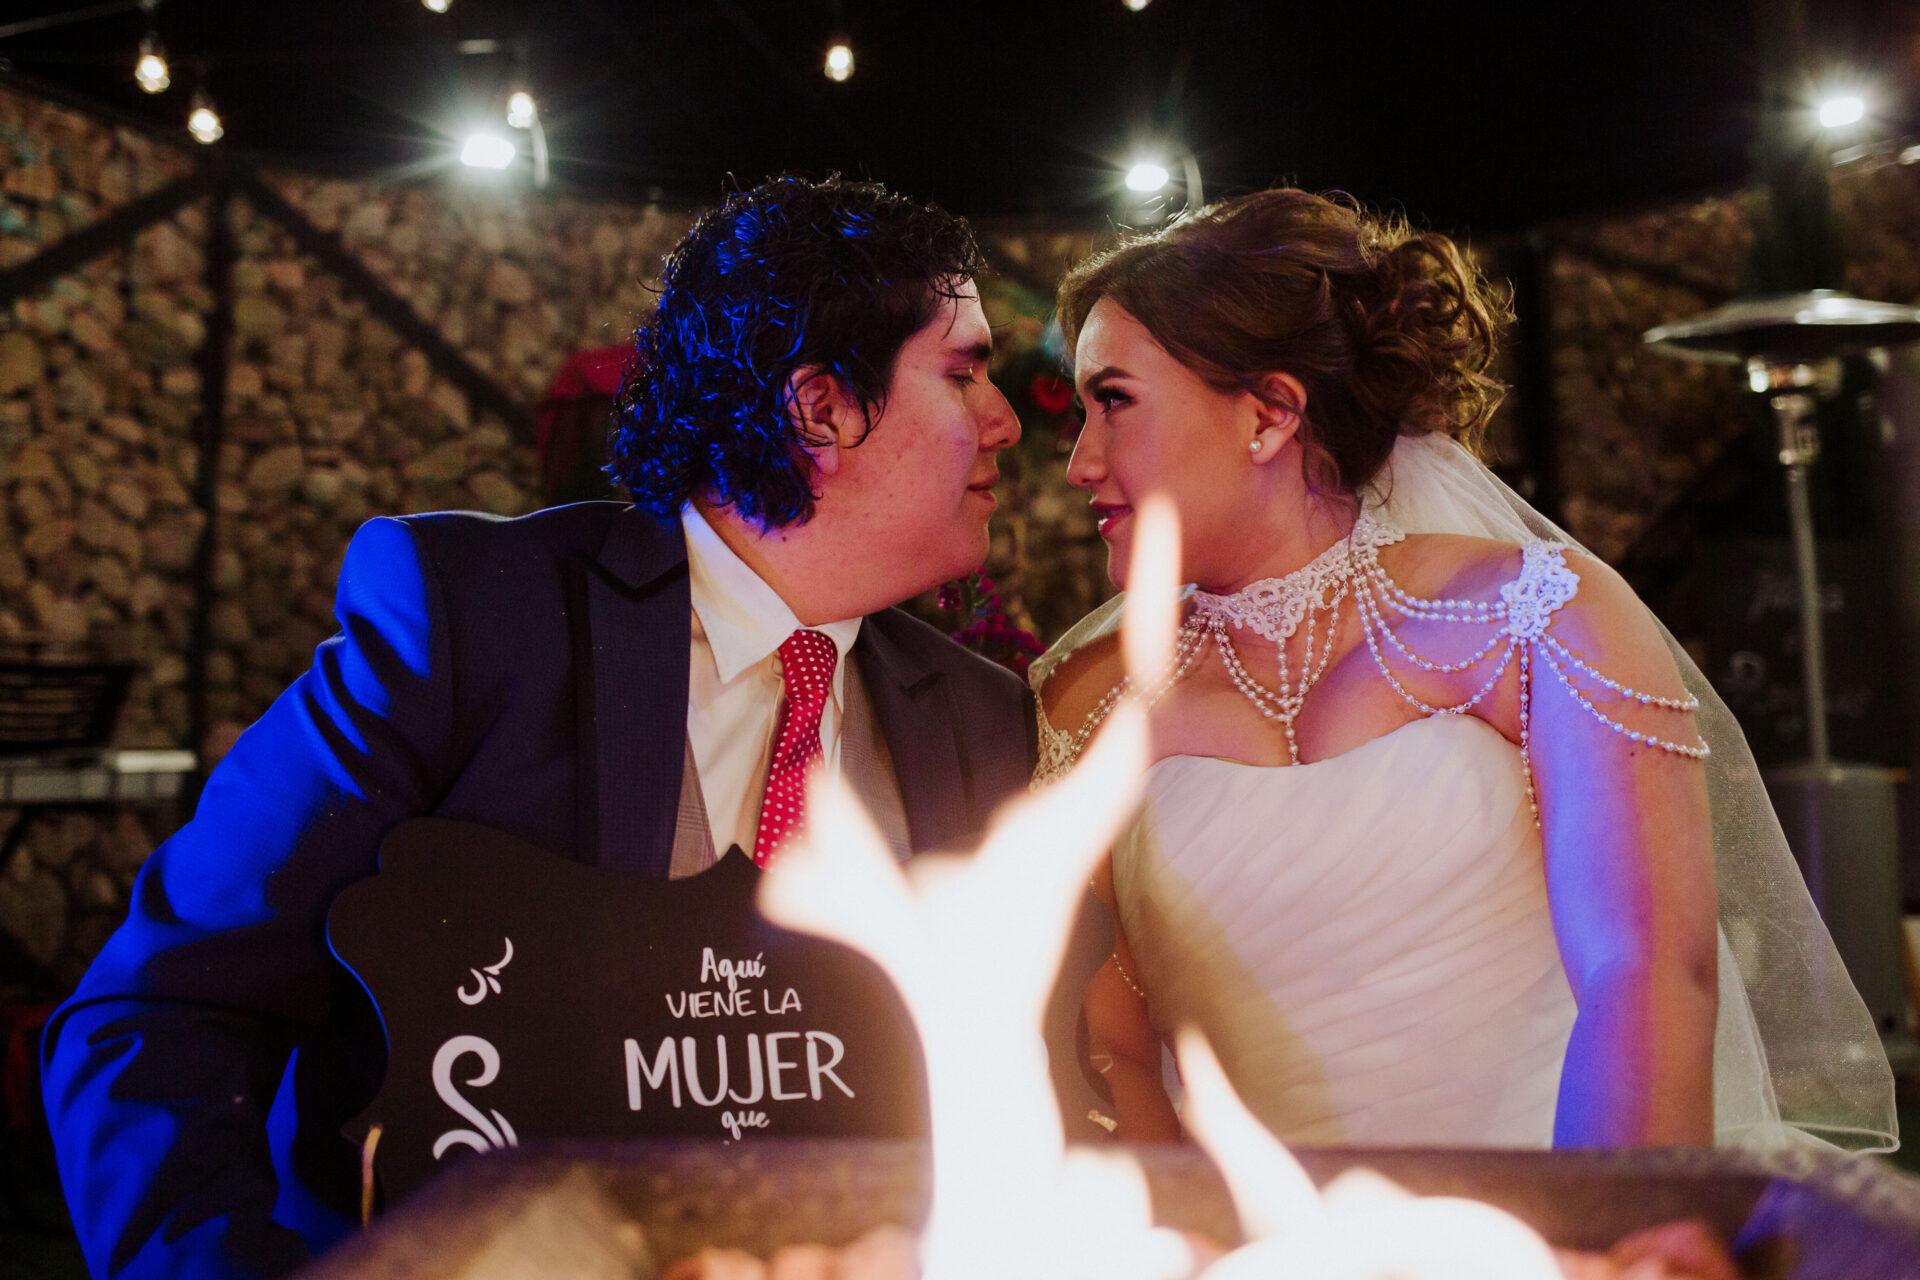 javier_noriega_fotografo_bodas_gaviones_zacatecas_wedding_photographer37